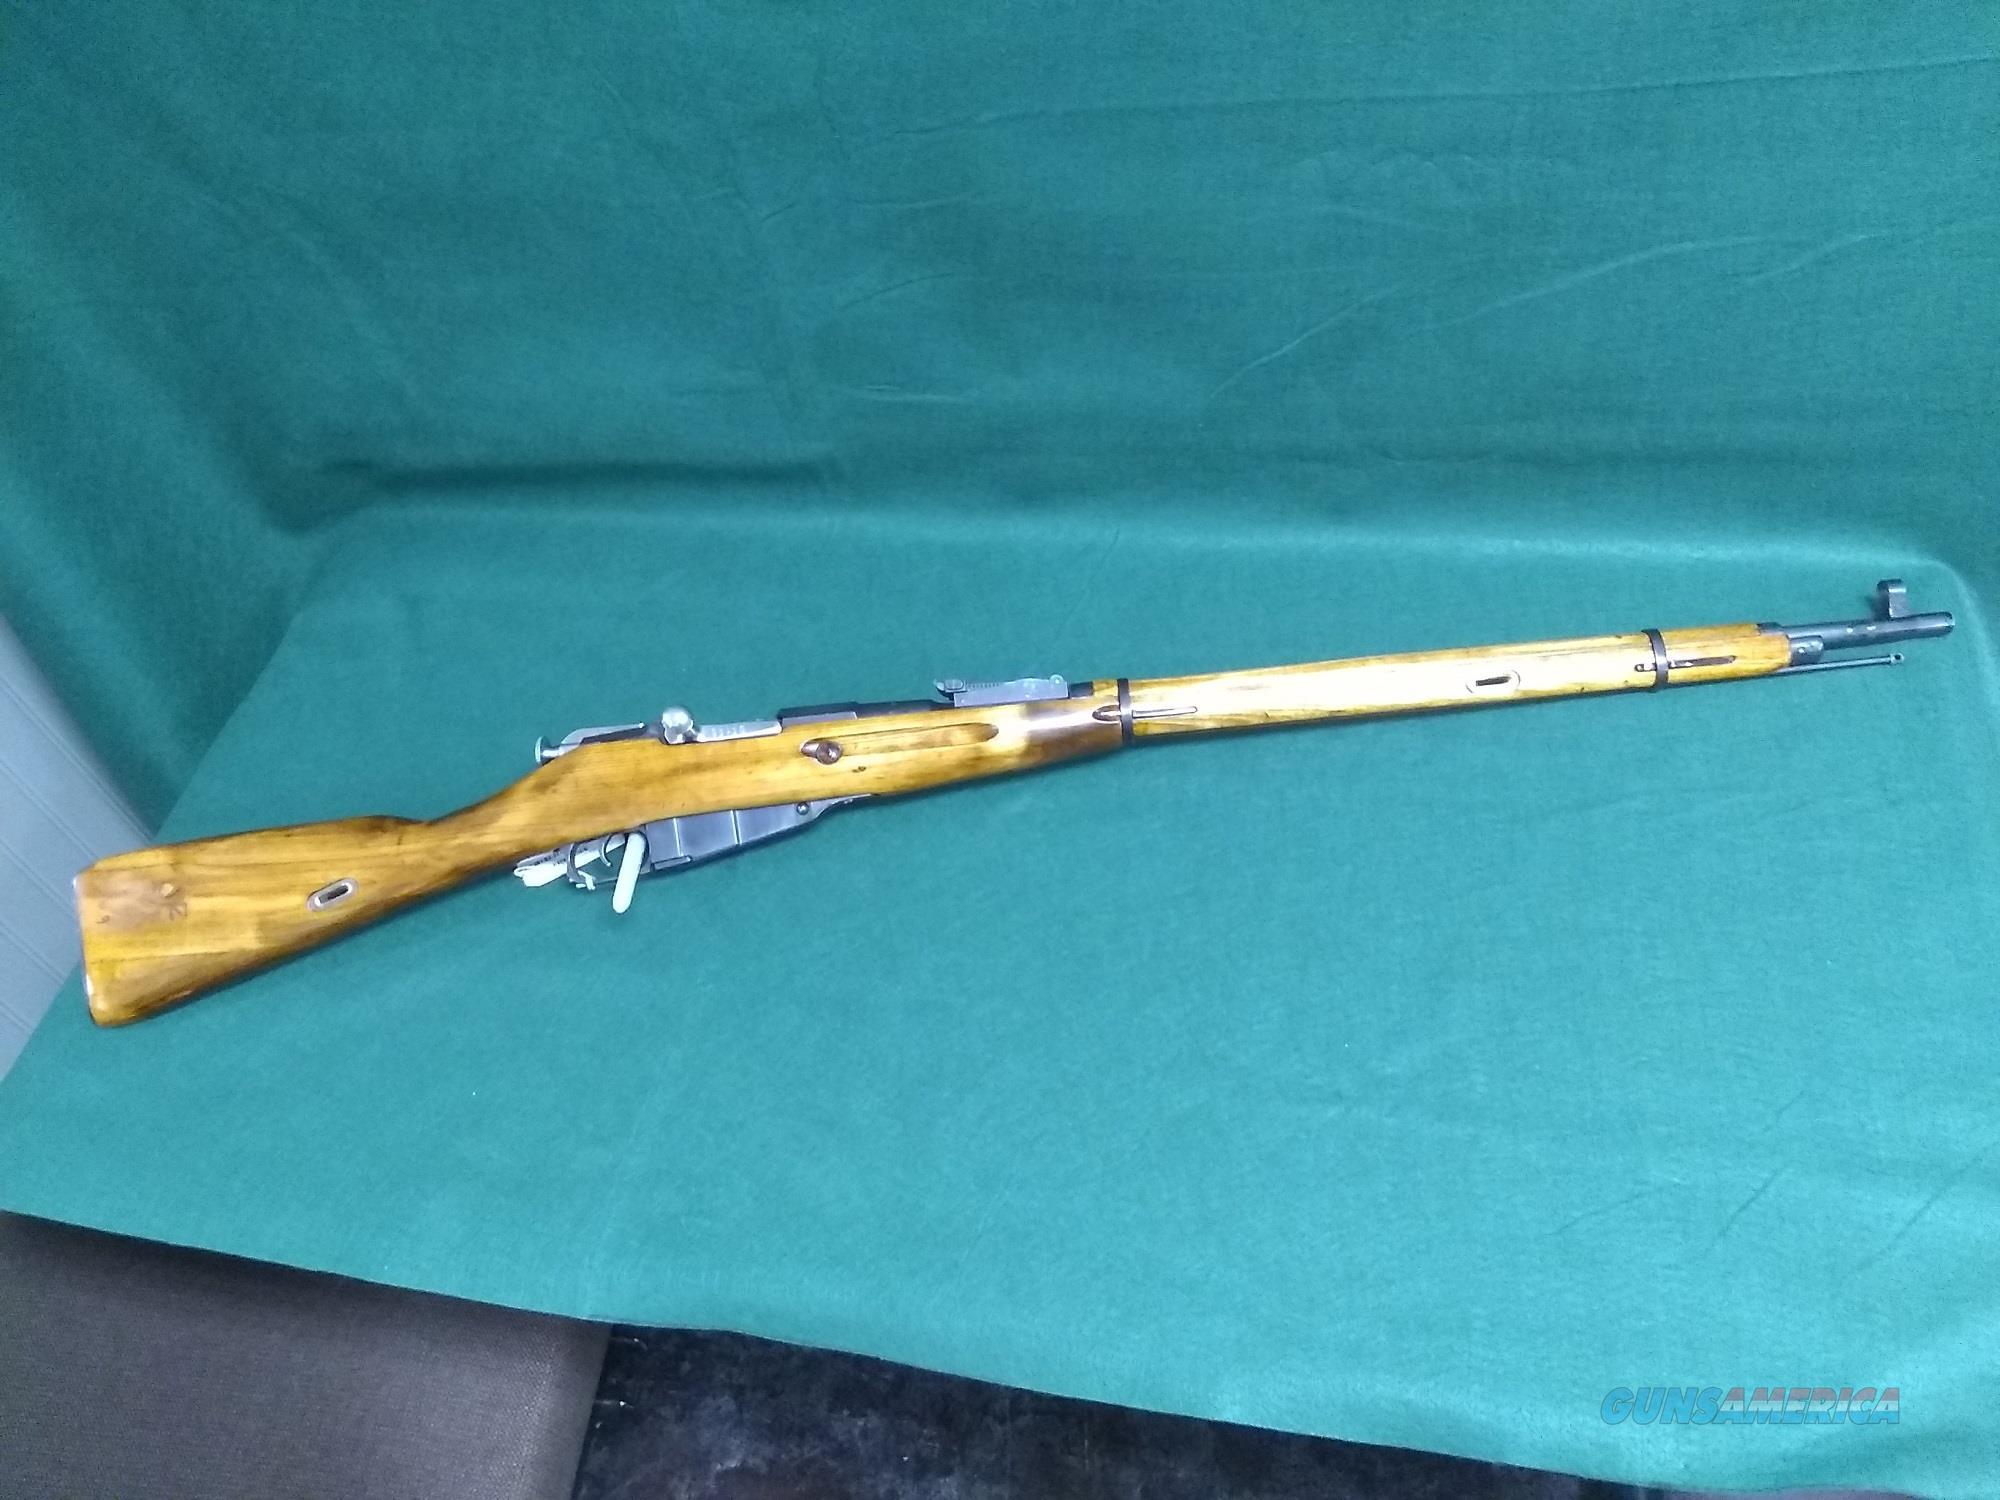 Mosin Nagant 9130 7.62X54R - Izhevsk Plant - Hex Receiver  Guns > Rifles > Mosin-Nagant Rifles/Carbines